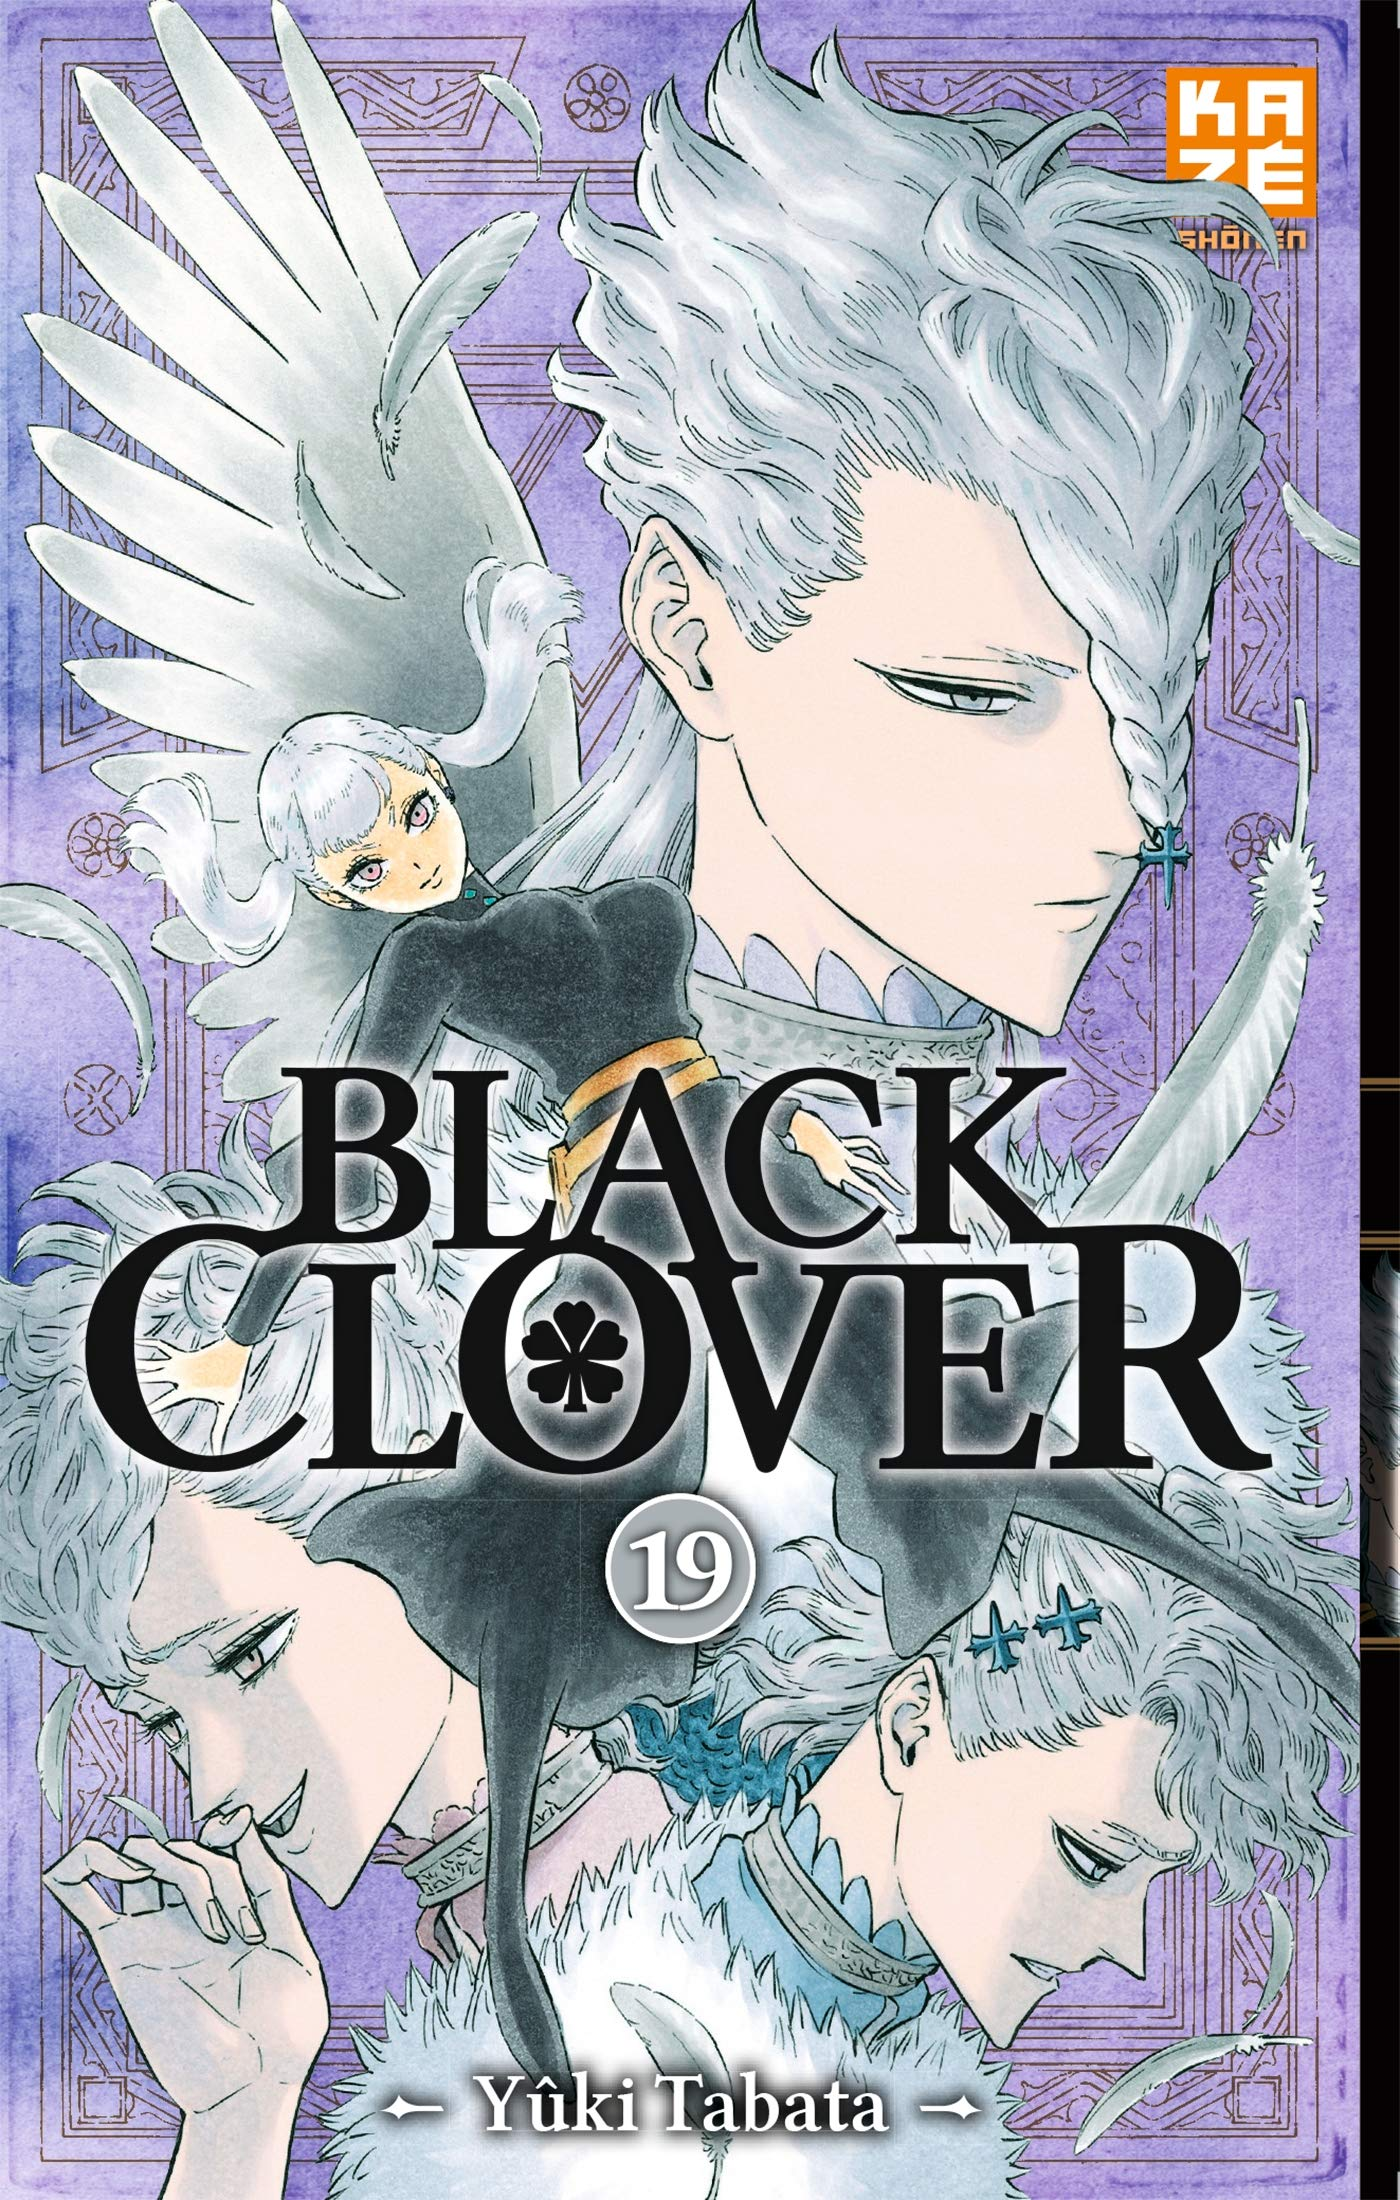 Un arc filler de Black Clover débutera le 14 avril 2020